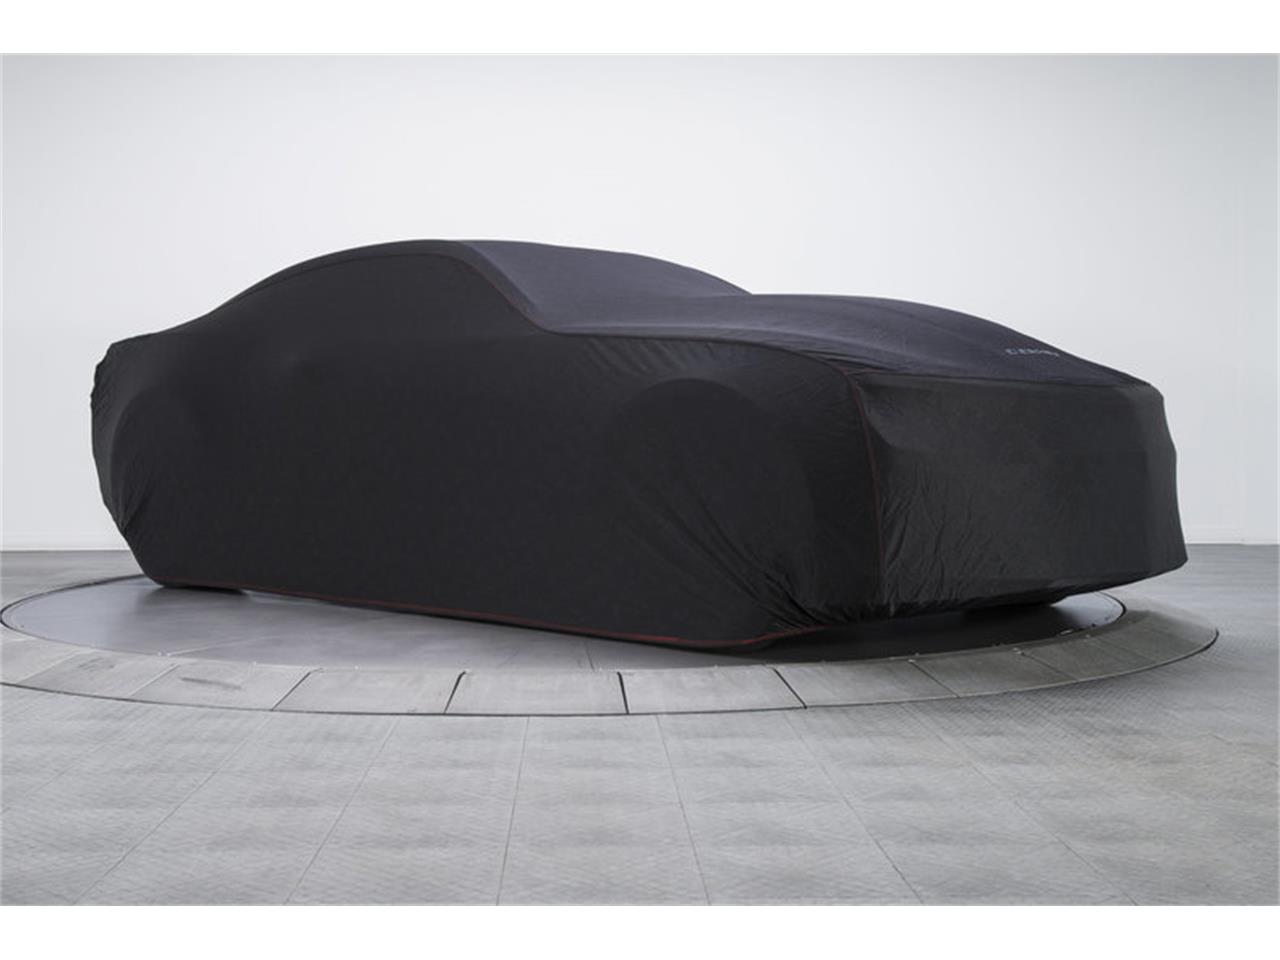 Large Picture of '16 Chevrolet Camaro COPO located in North Carolina - $139,900.00 - MFAR